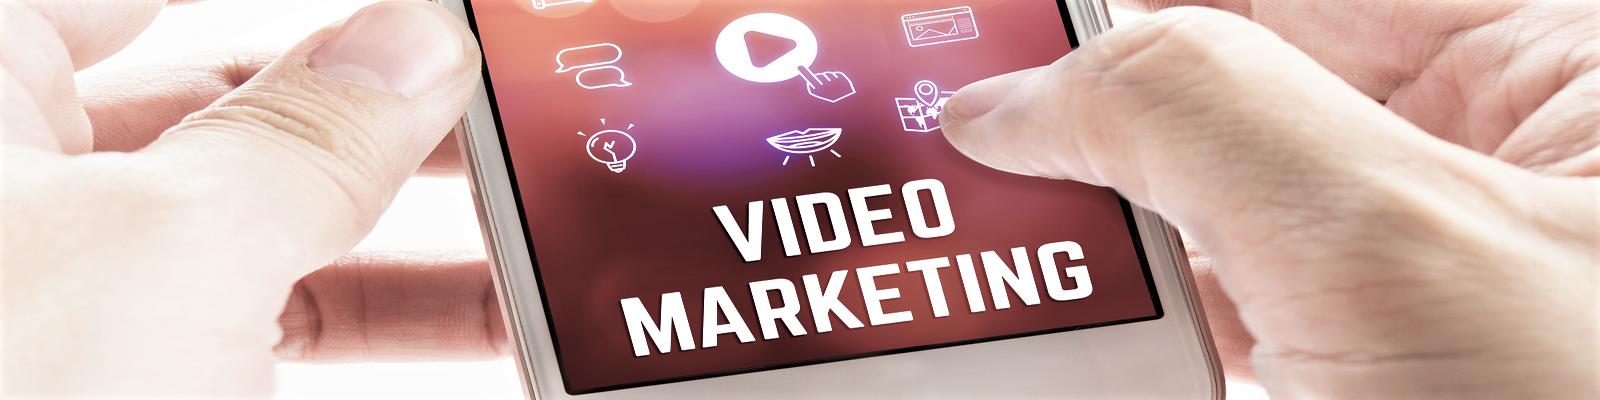 Mont_Digital_Video_Marketing